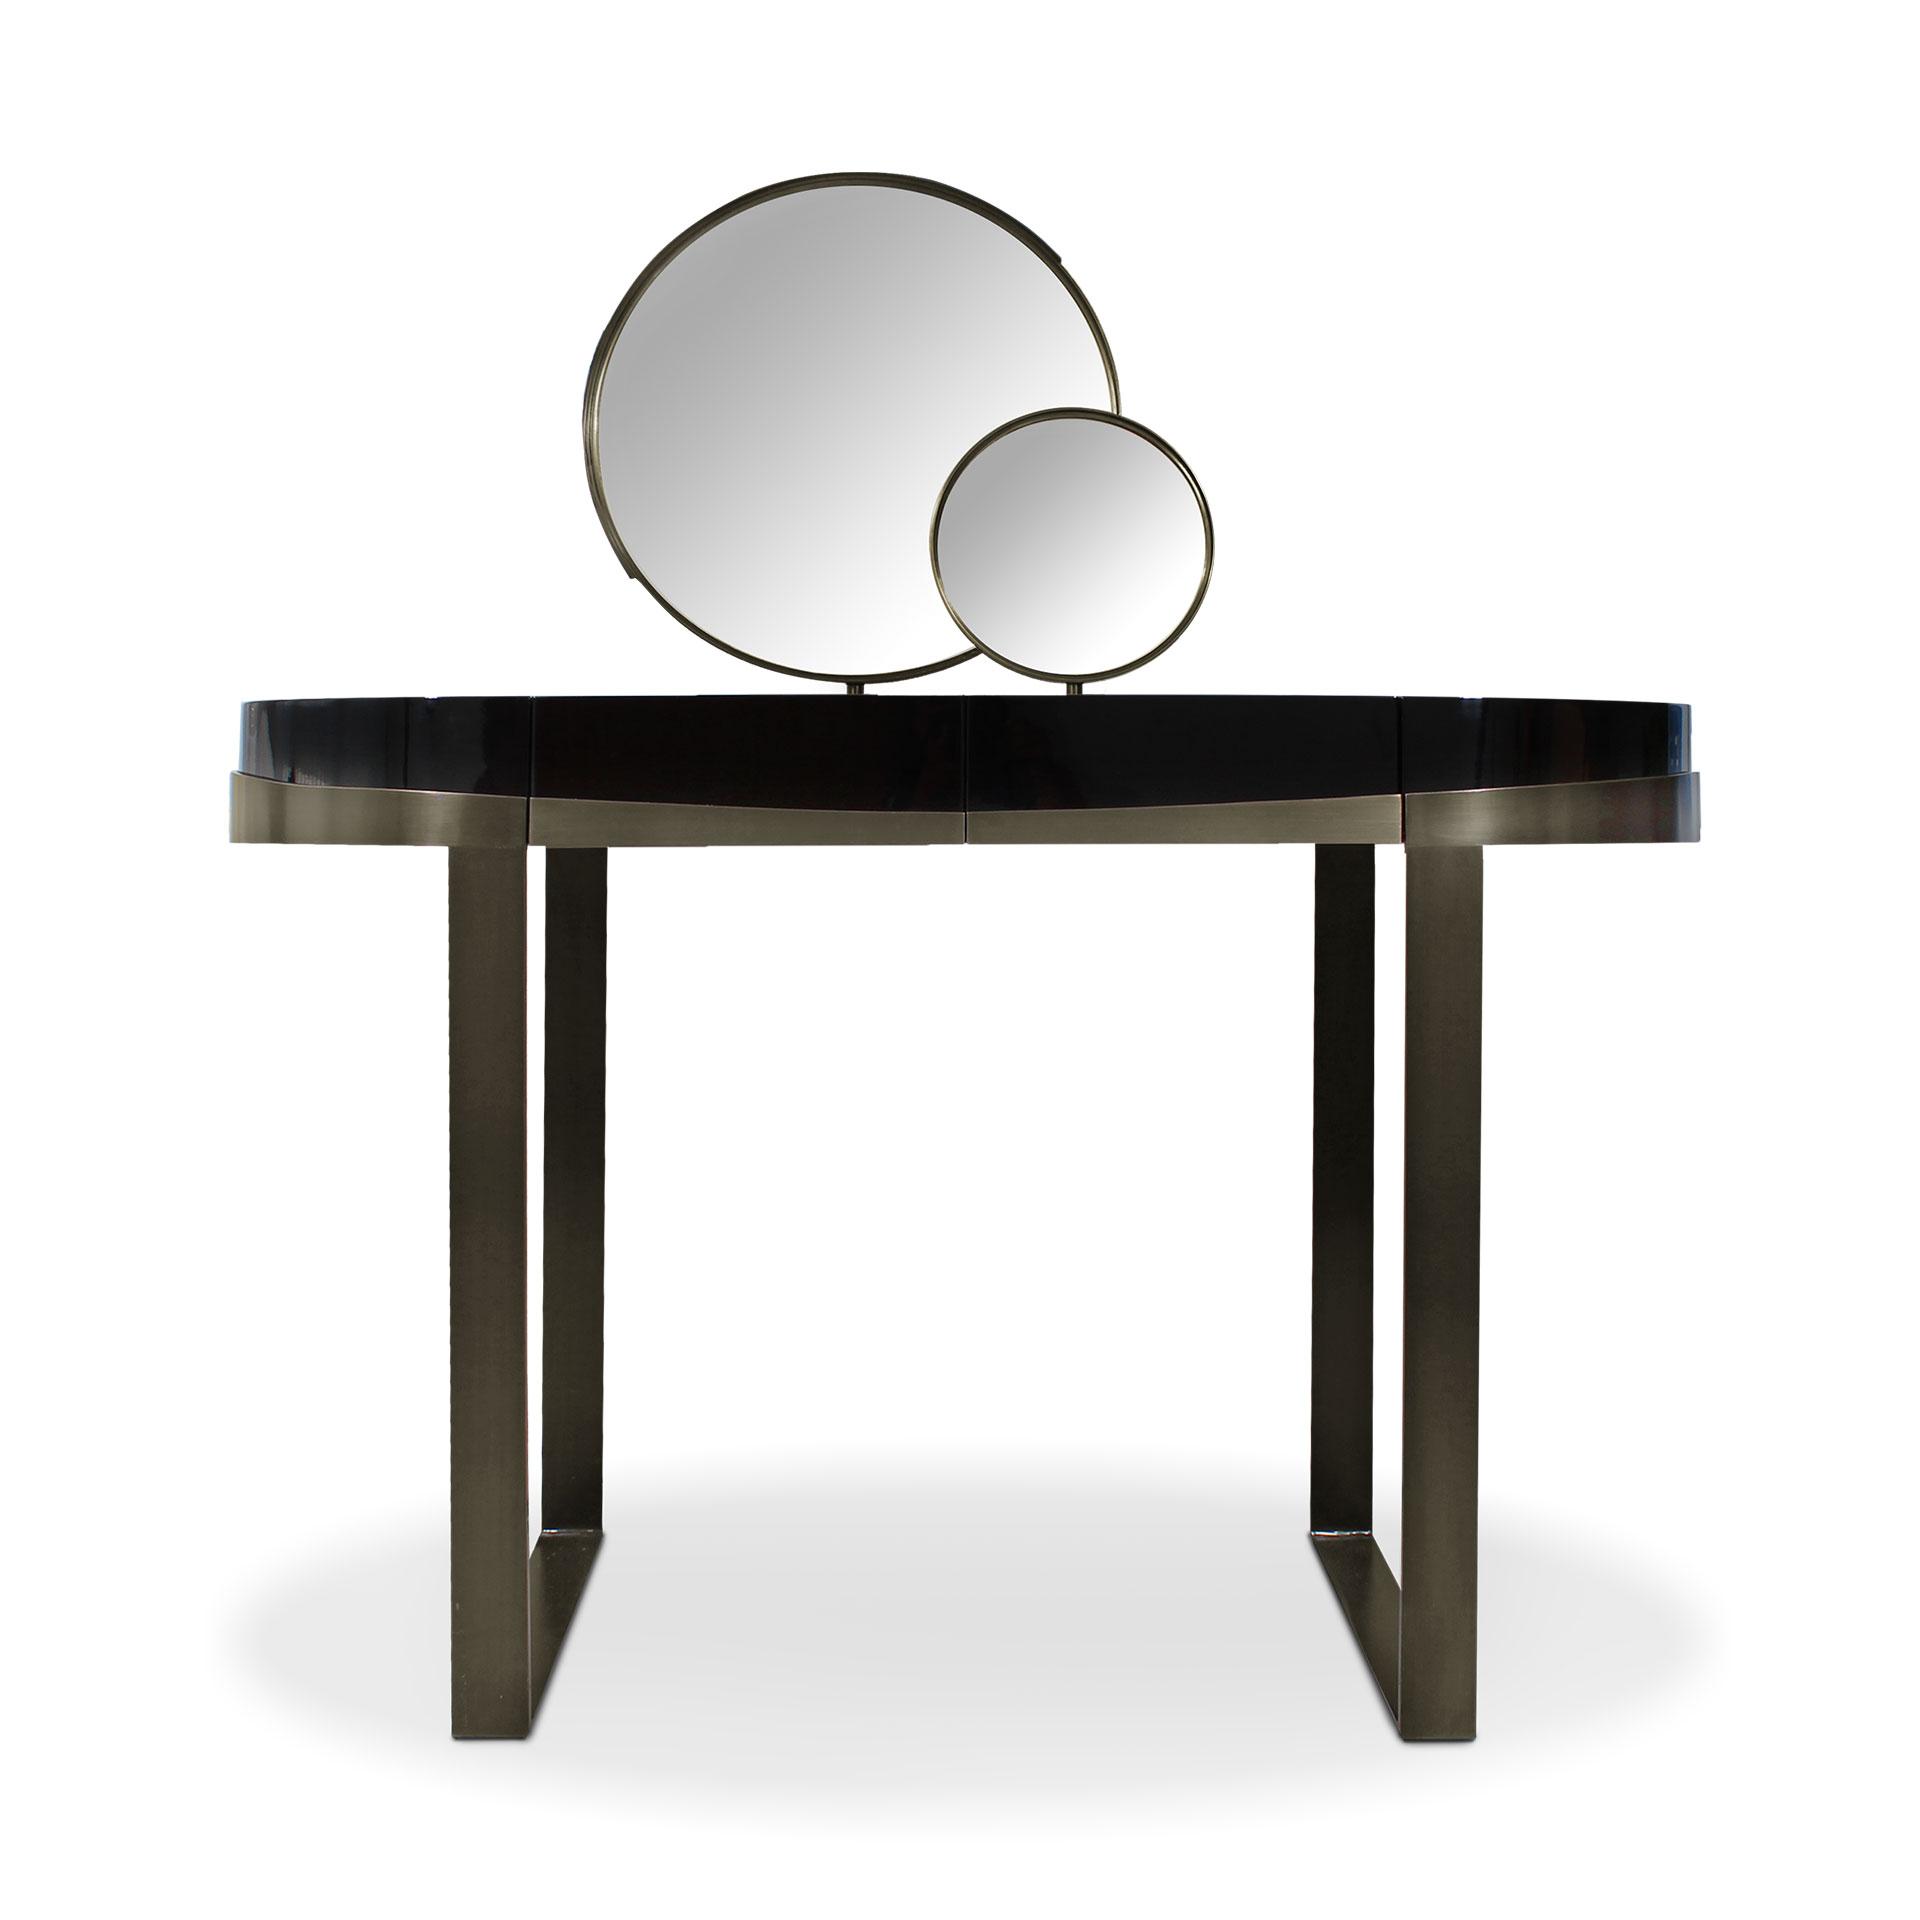 Aldrich dressing table